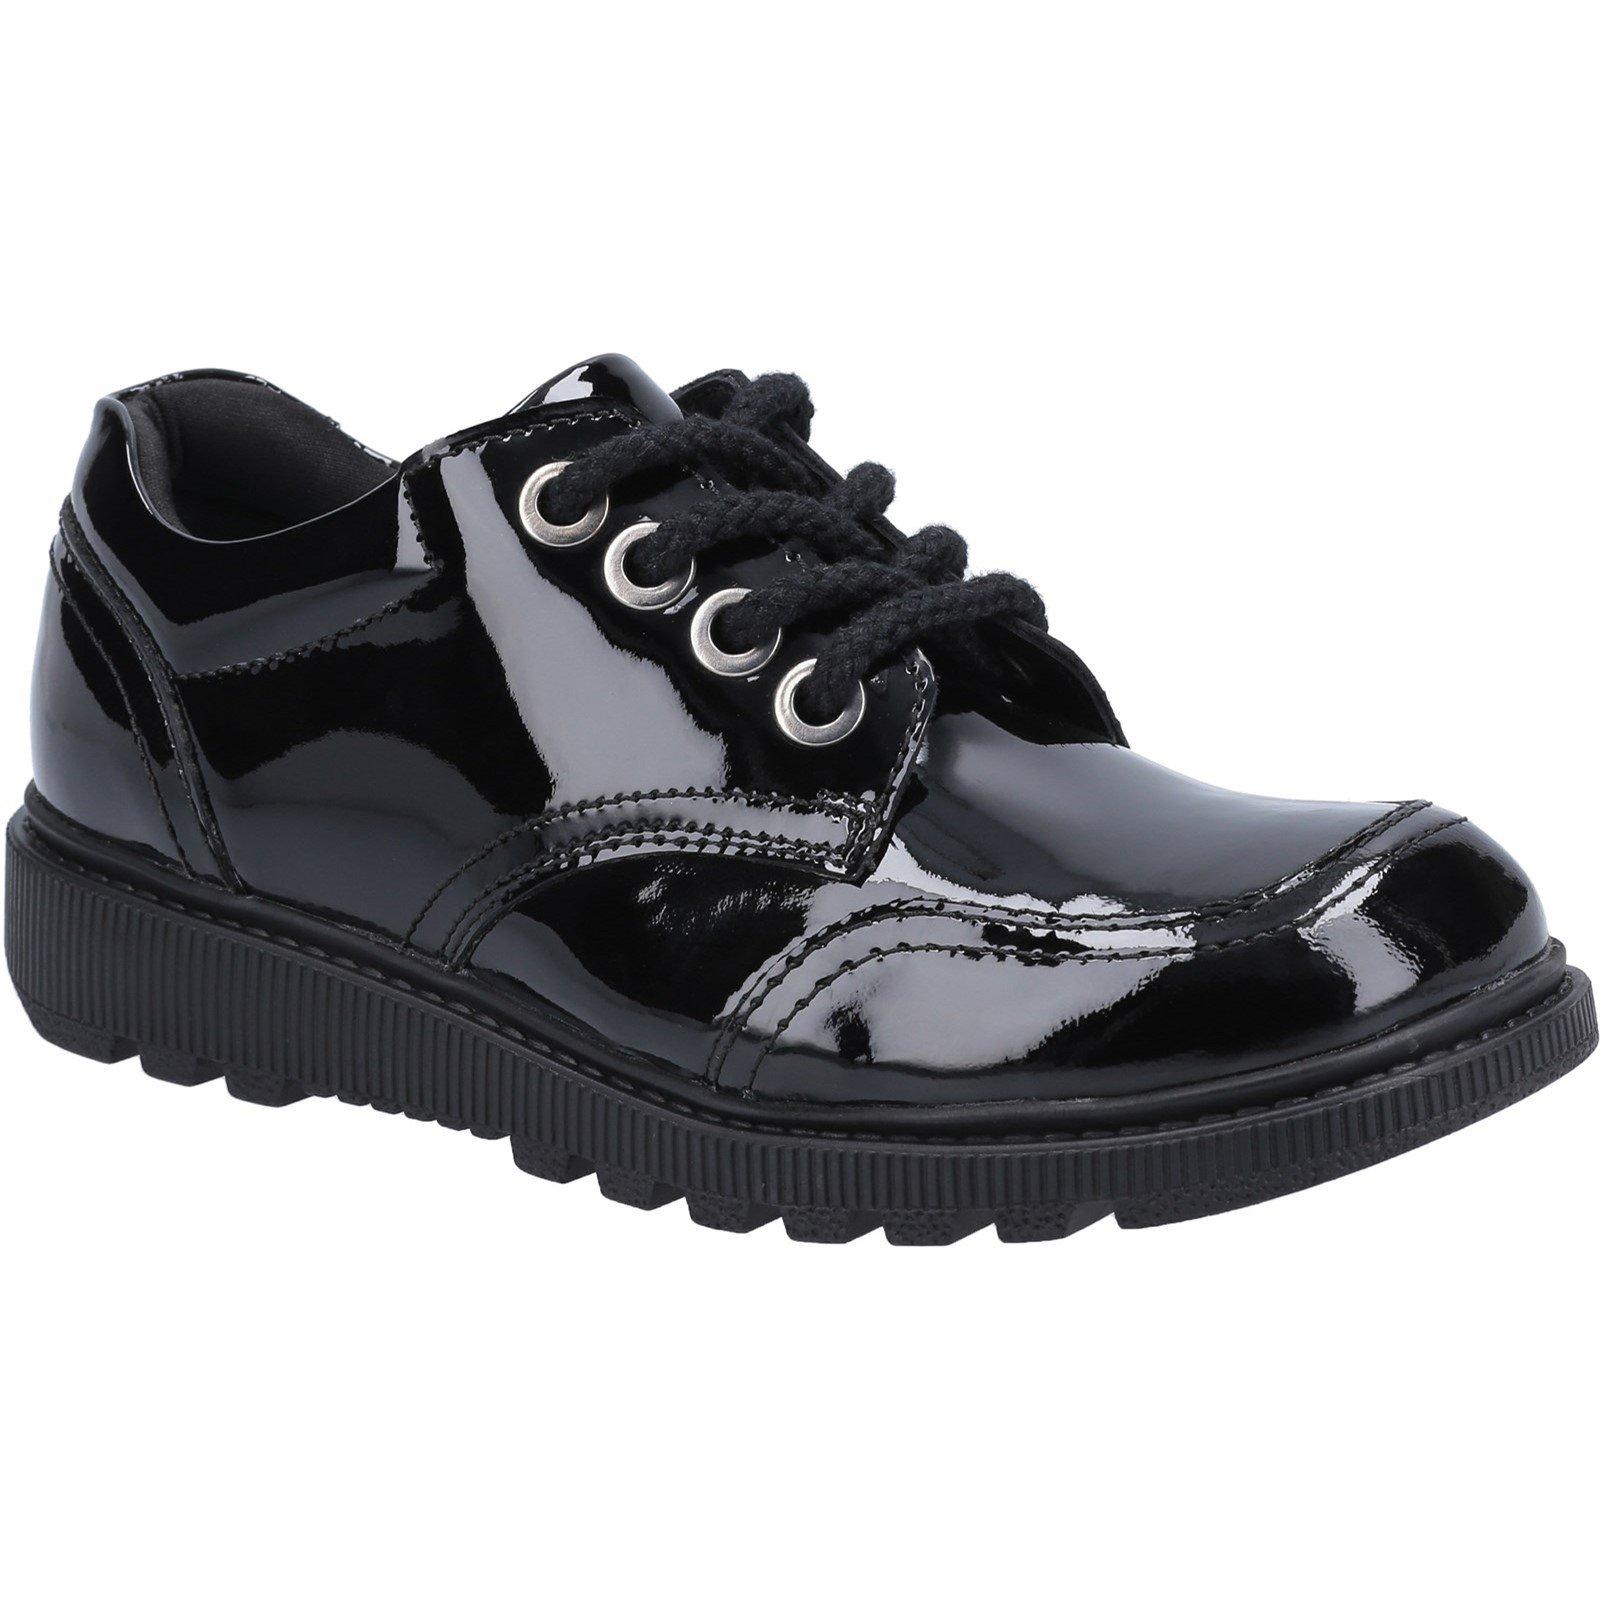 Hush Puppies Kid's Kiera Junior Patent School Shoe Black 30823 - Patent Black 10